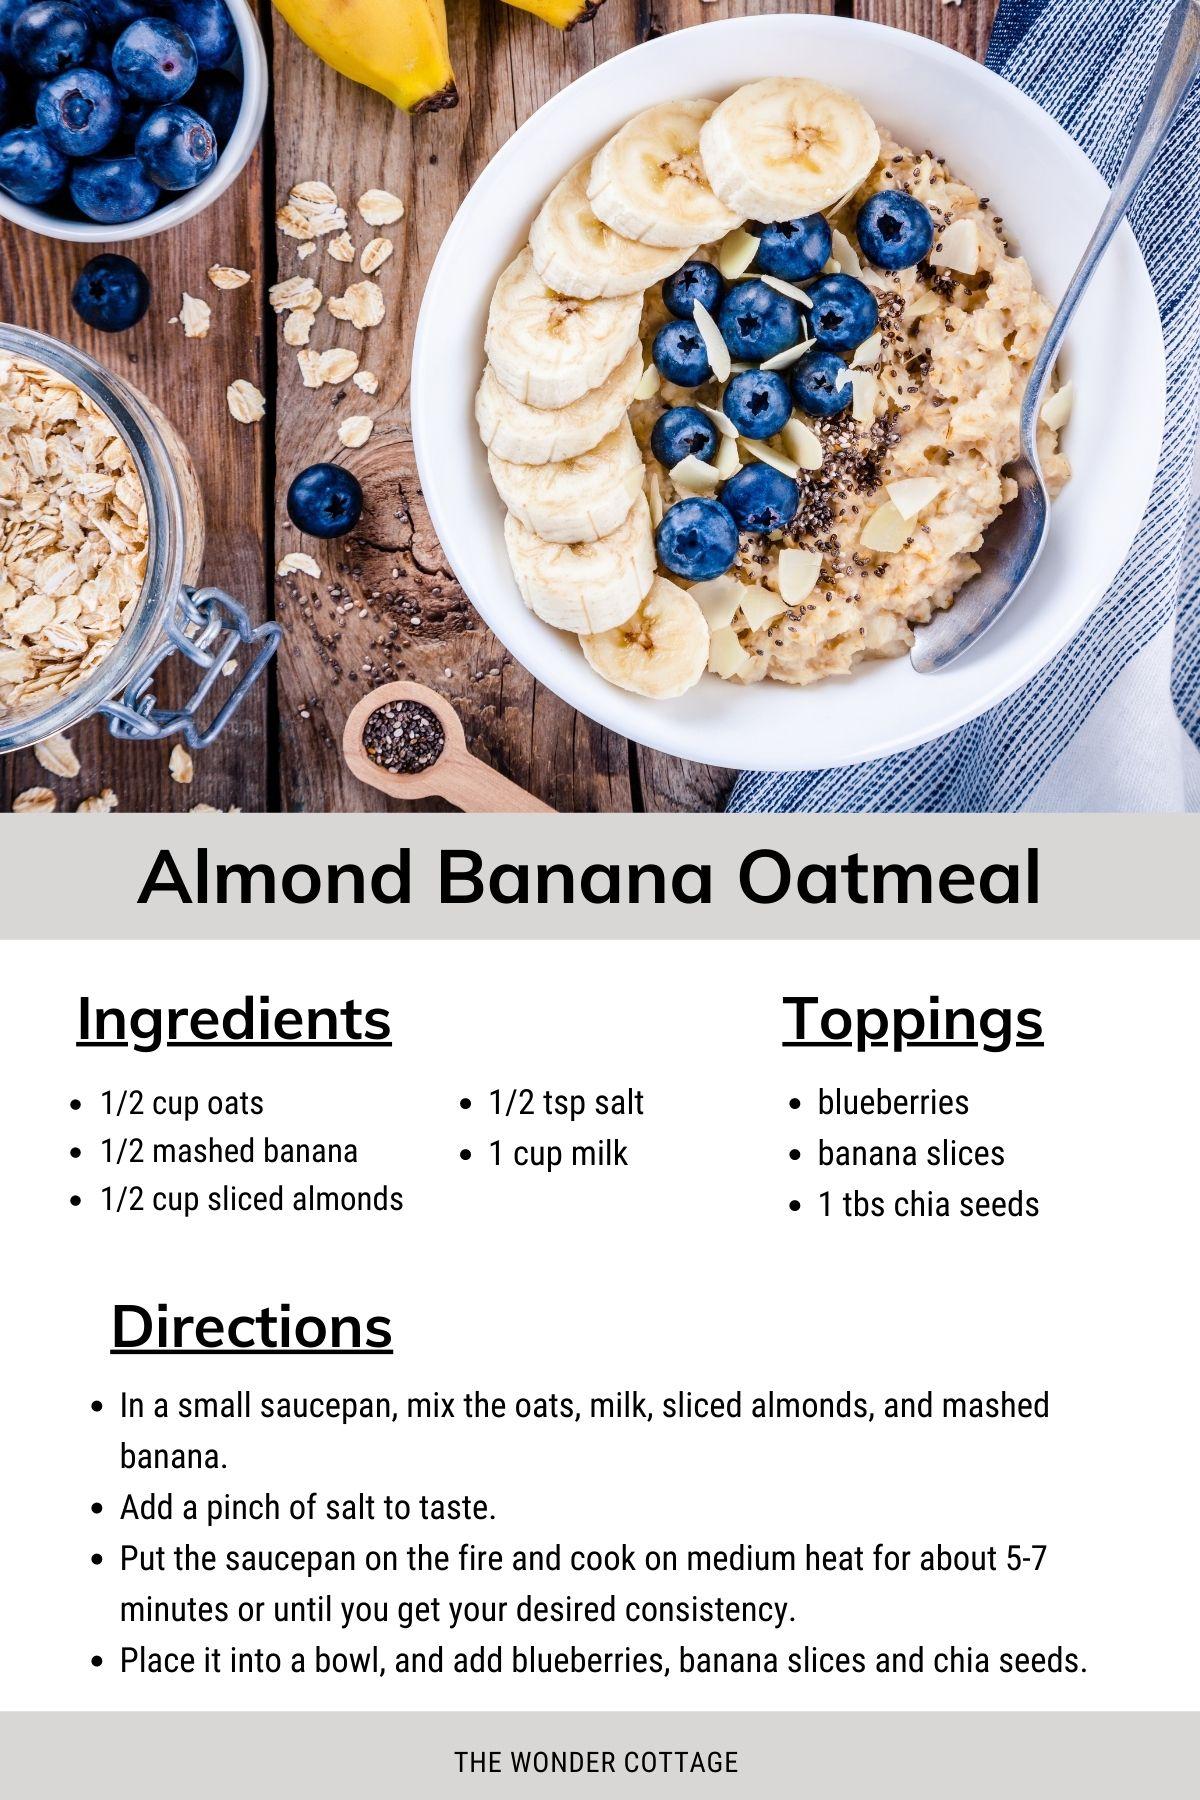 almond banana oatmeal recipe